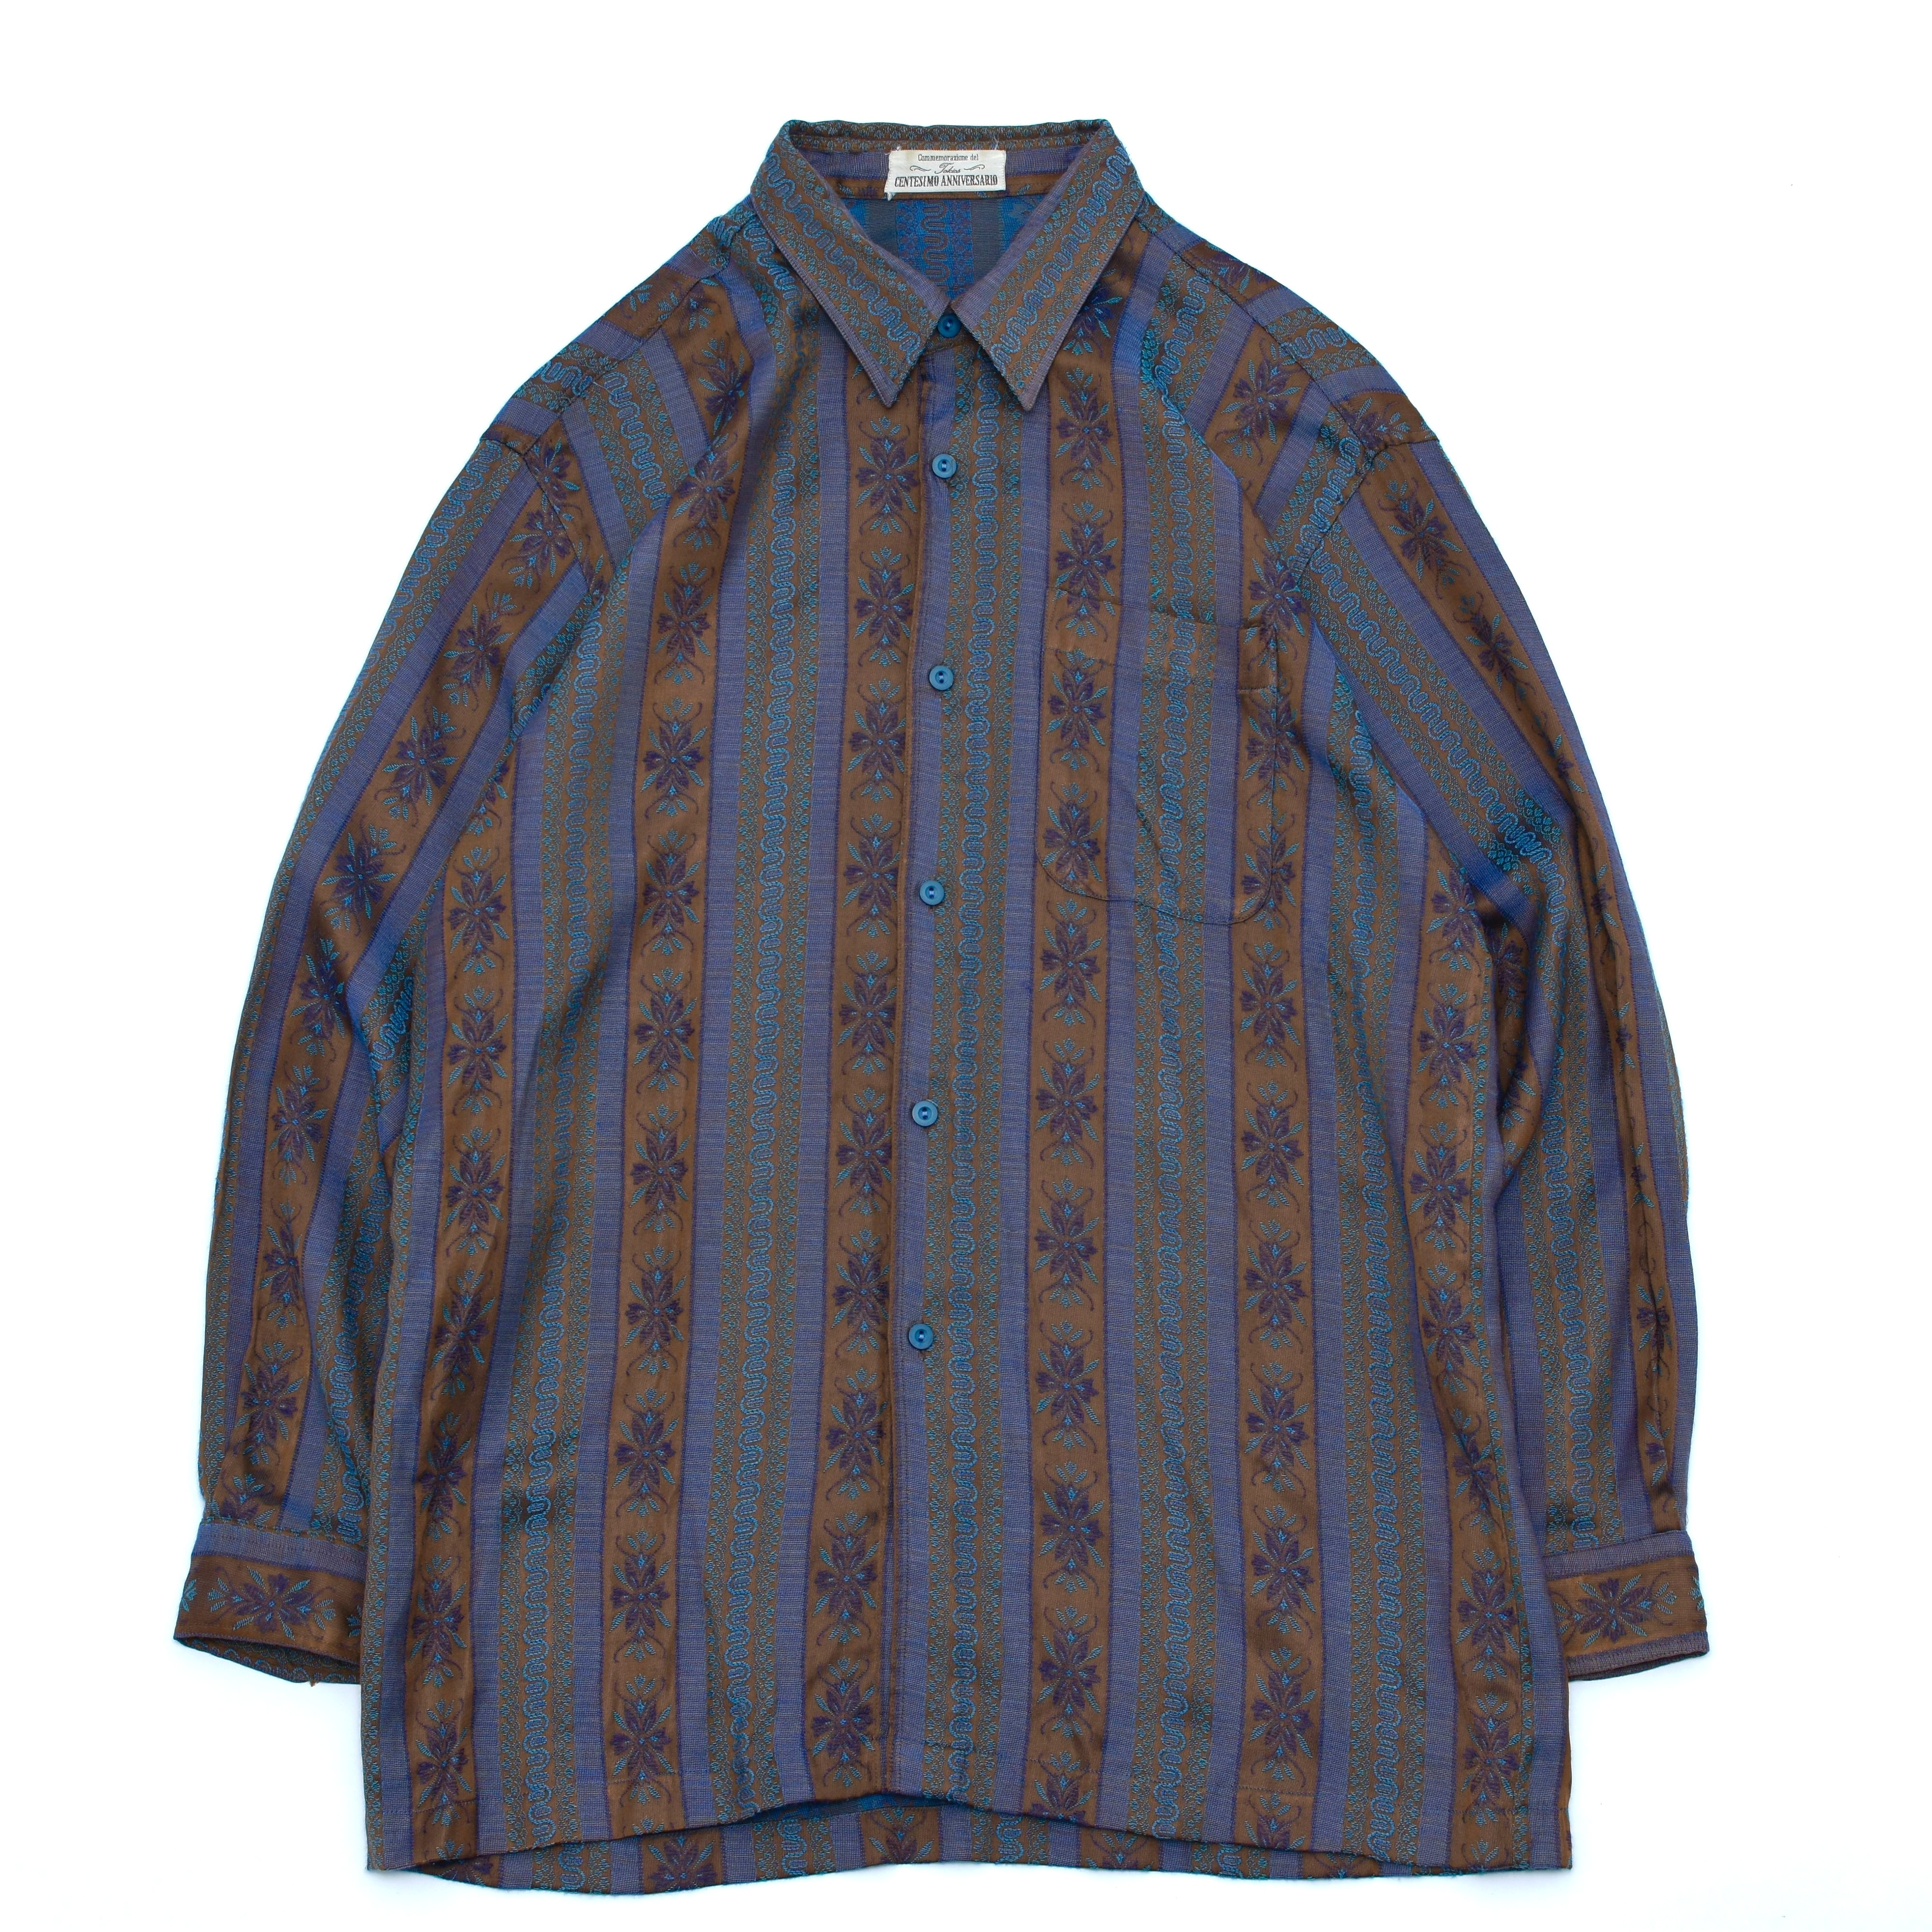 Antique flower stripe tapestry shirt